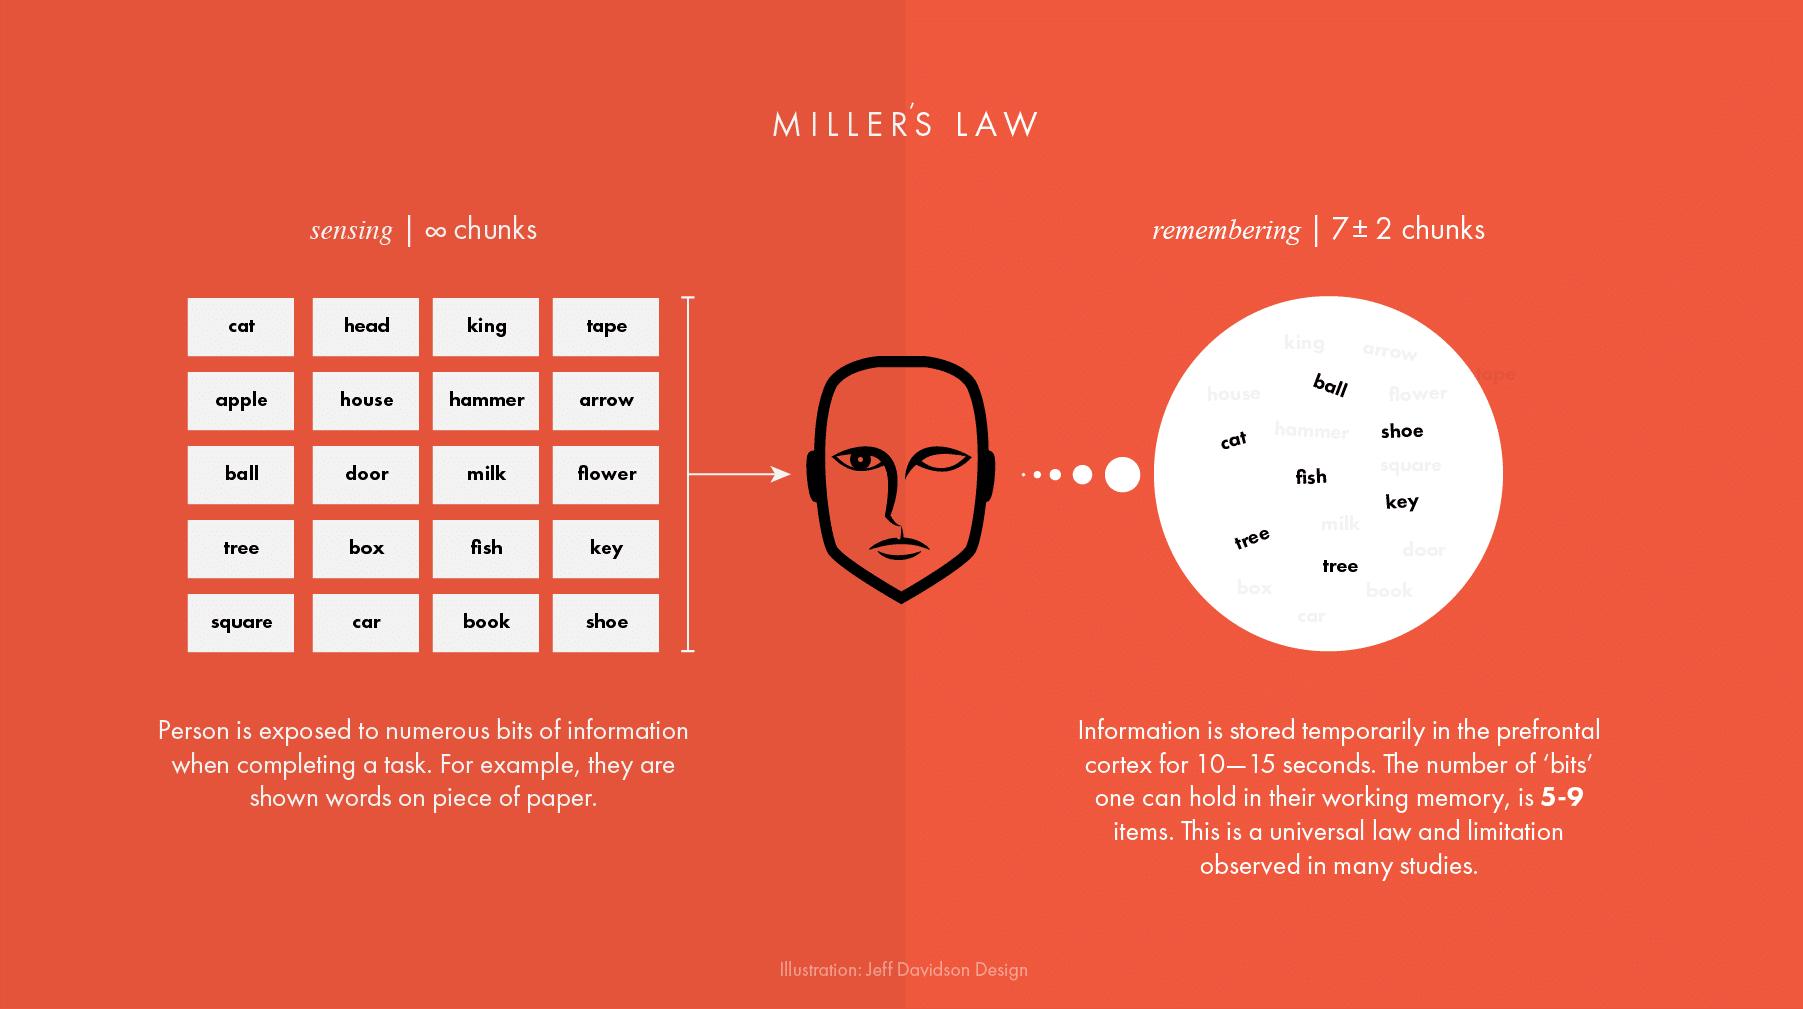 Lei de Miller